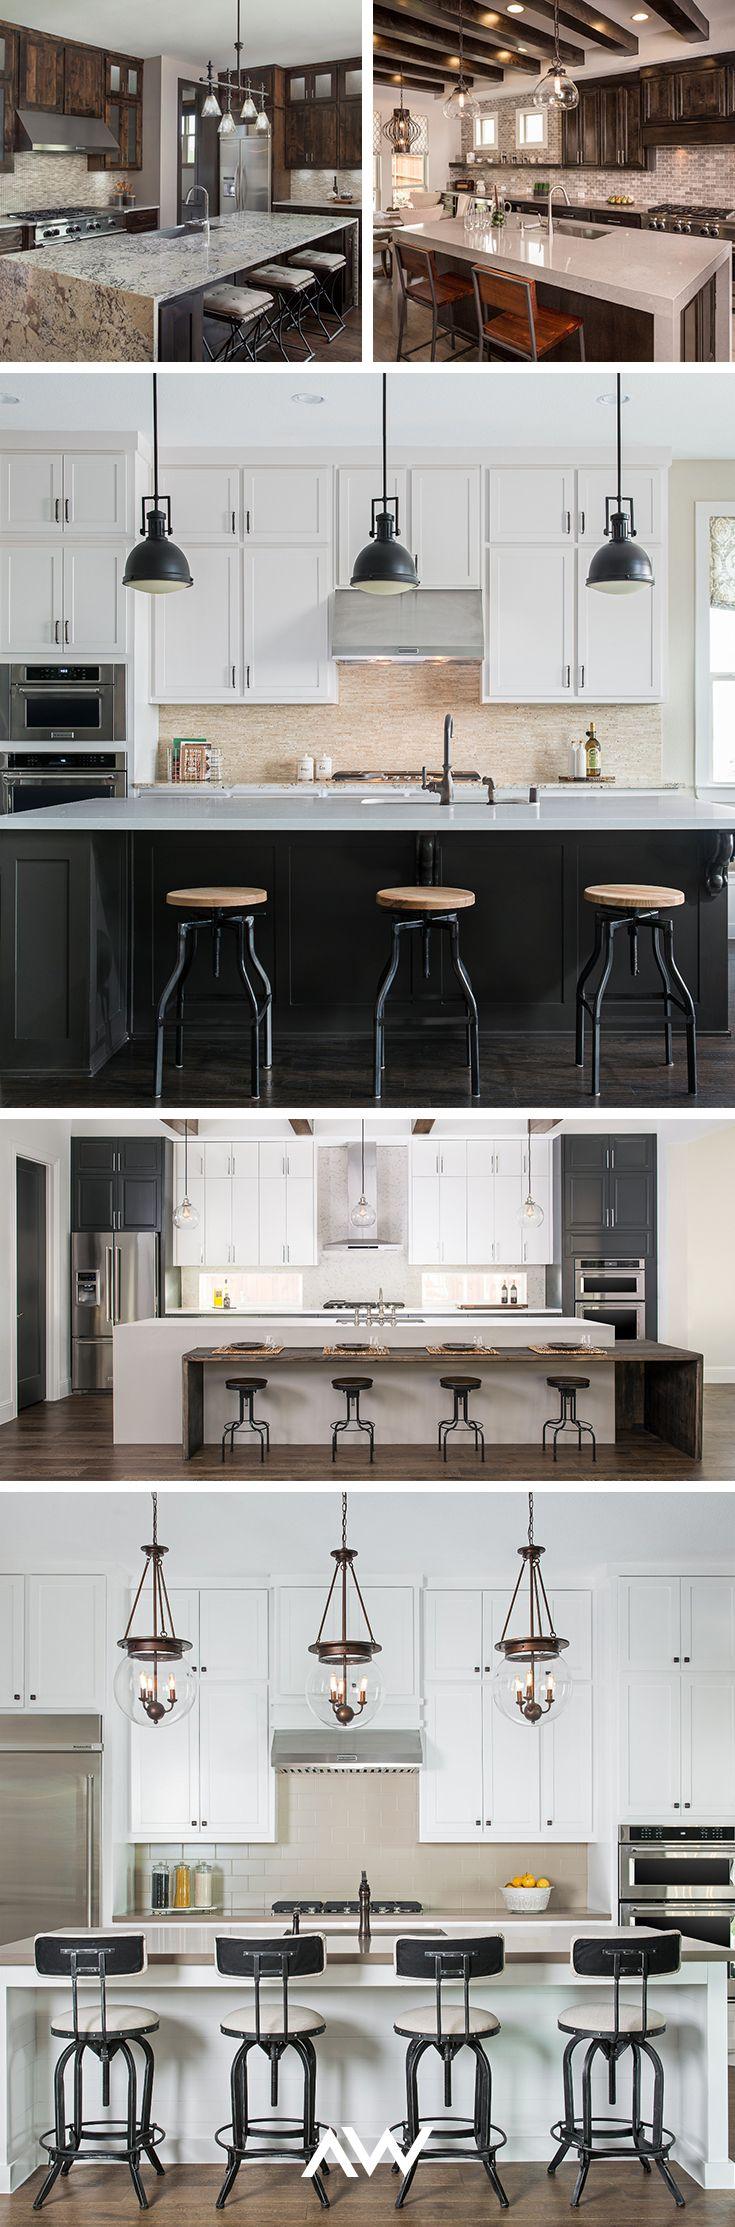 63 best Kitchens images on Pinterest | Design trends, Kitchen ideas ...